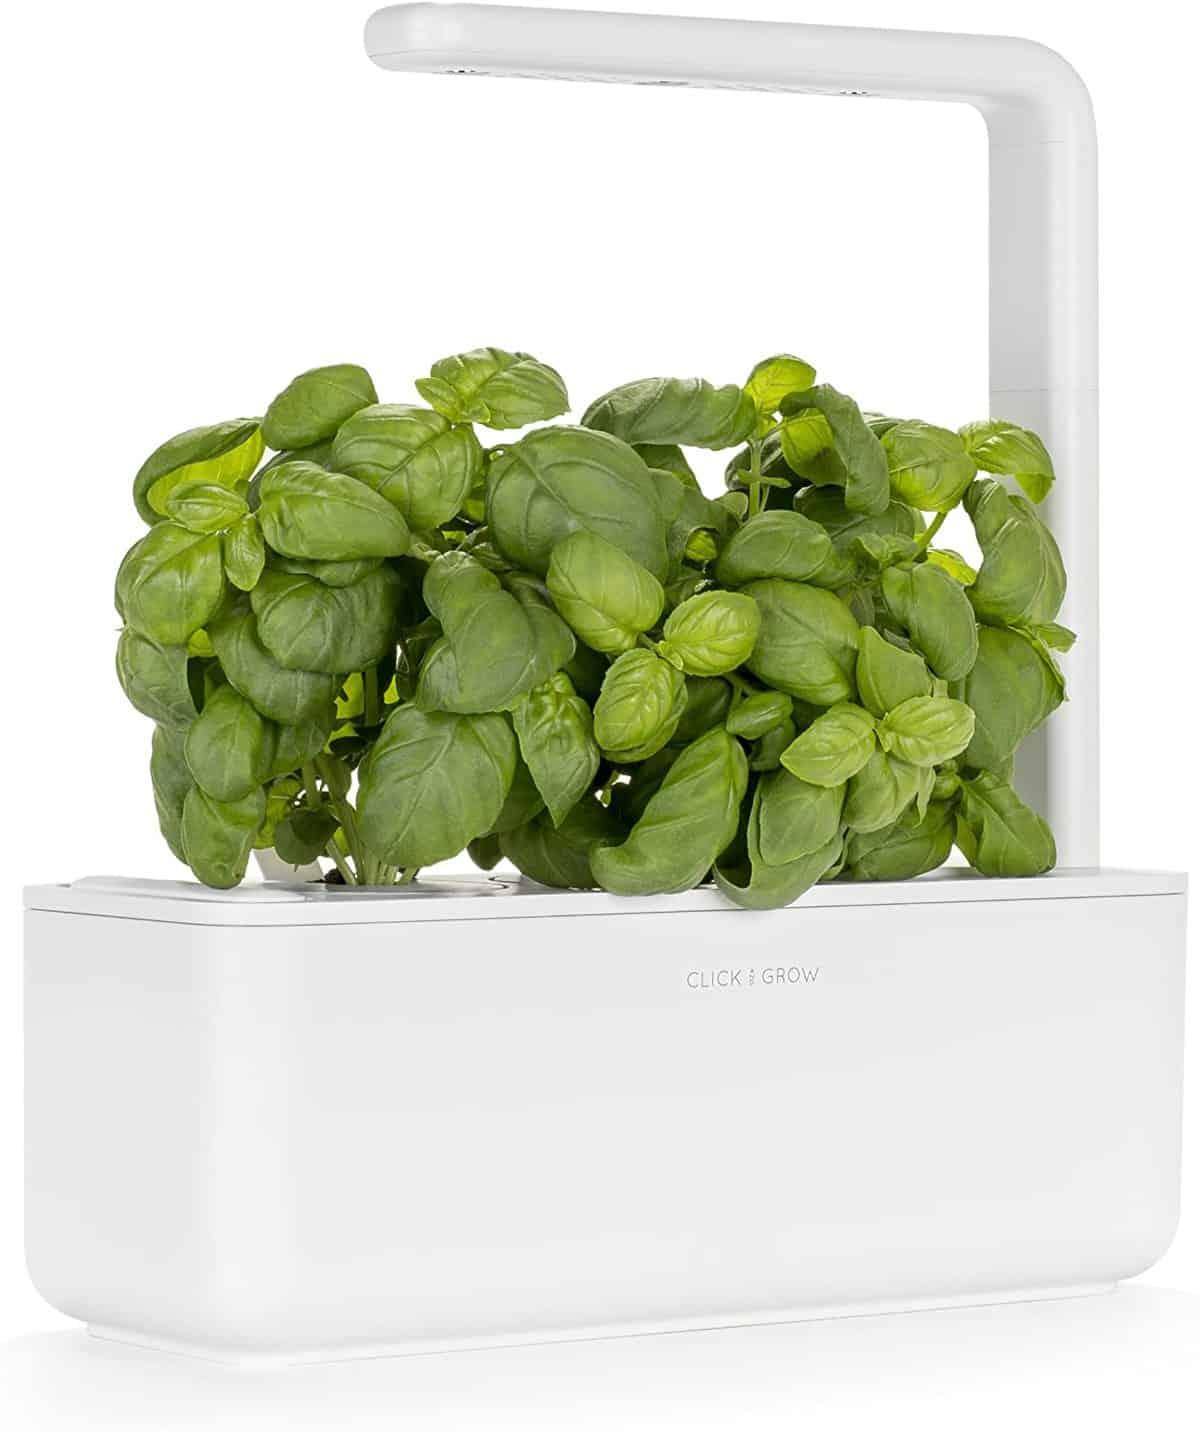 Click and Grow 3 Smart Garden